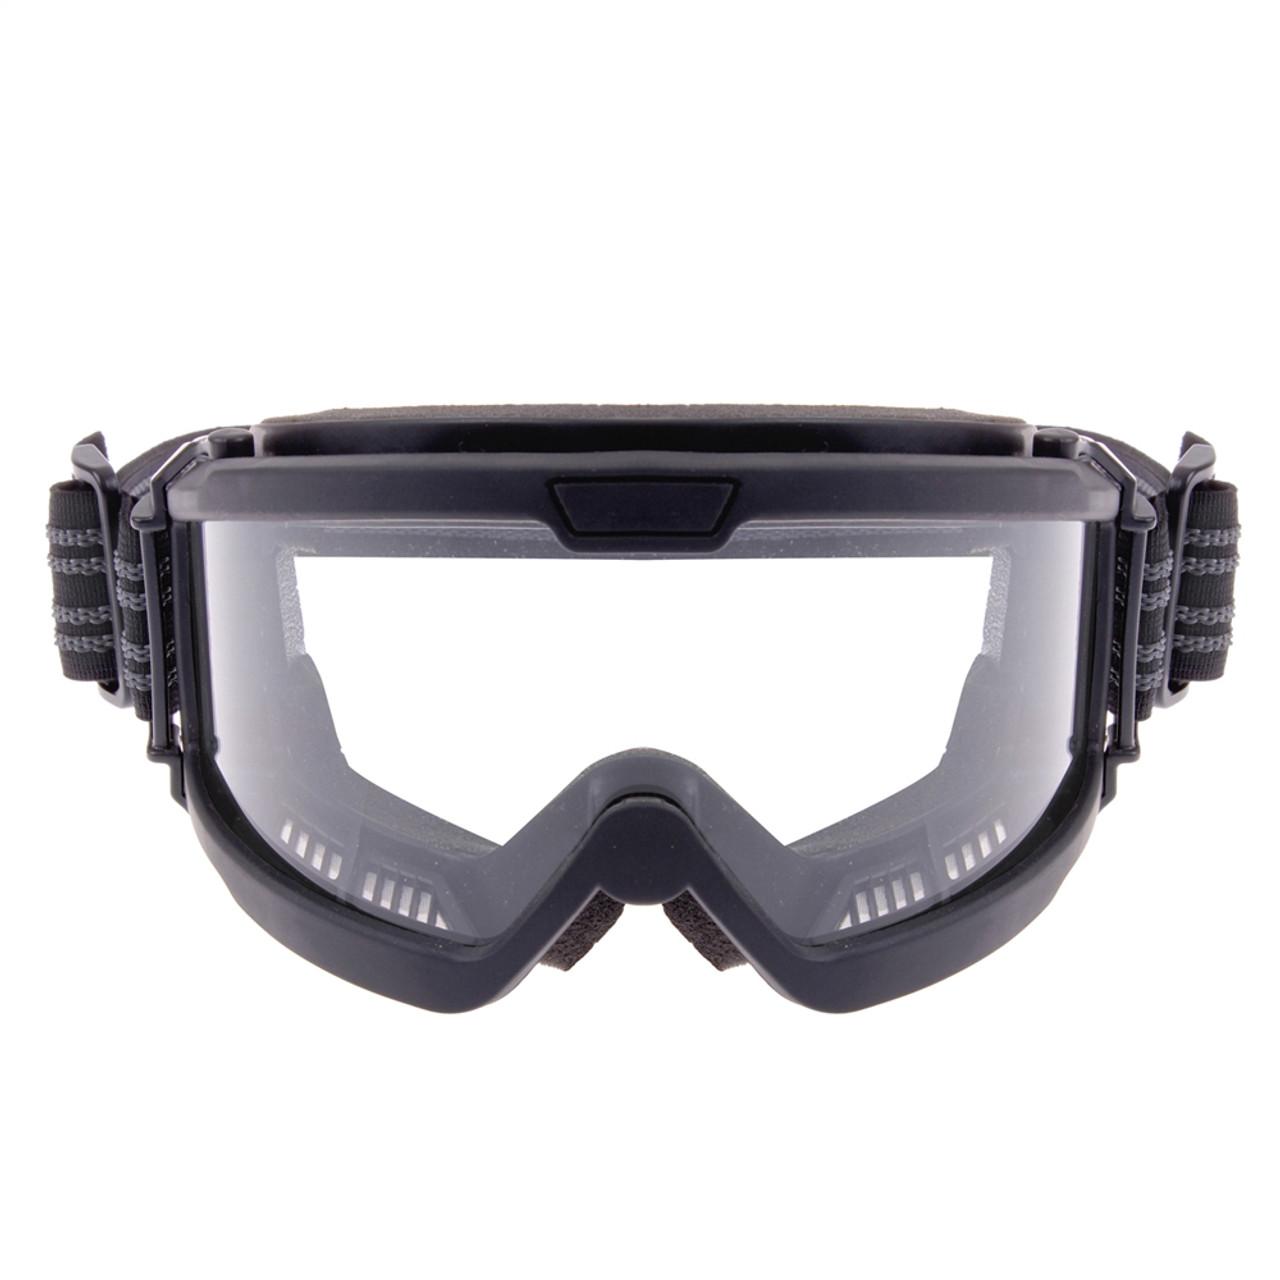 ANSI Ballistic OTG Goggle System from Hessen Militaria